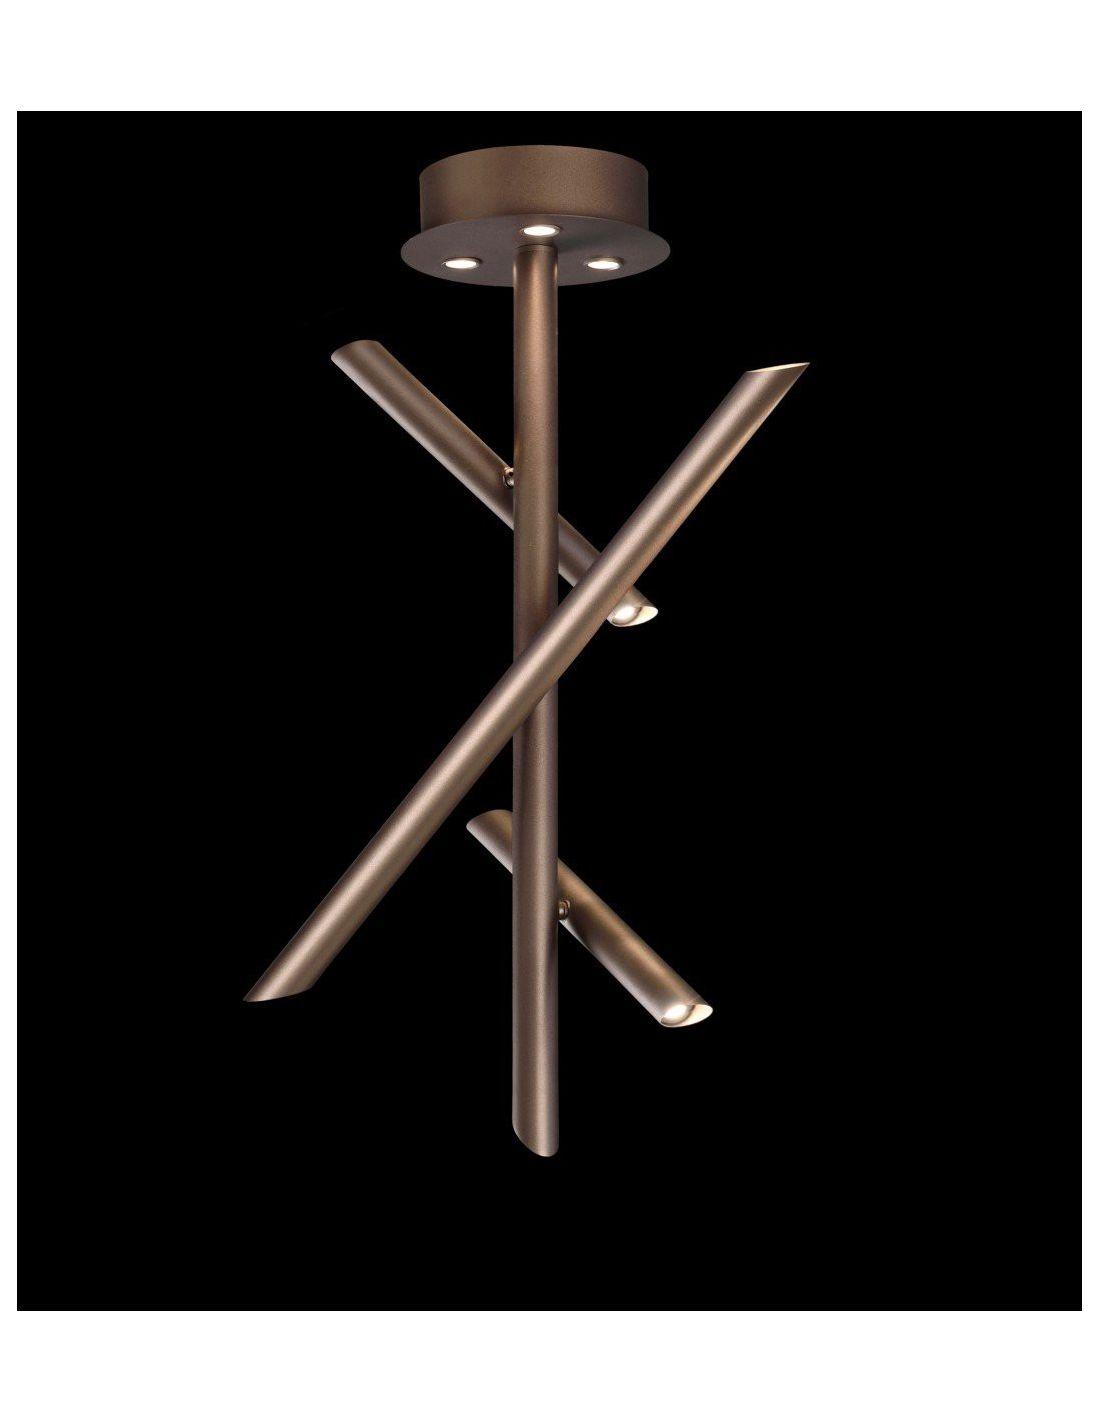 Semiplaf n take bronce de mantra iluminaci n env o gratis for Plafones led pared bano